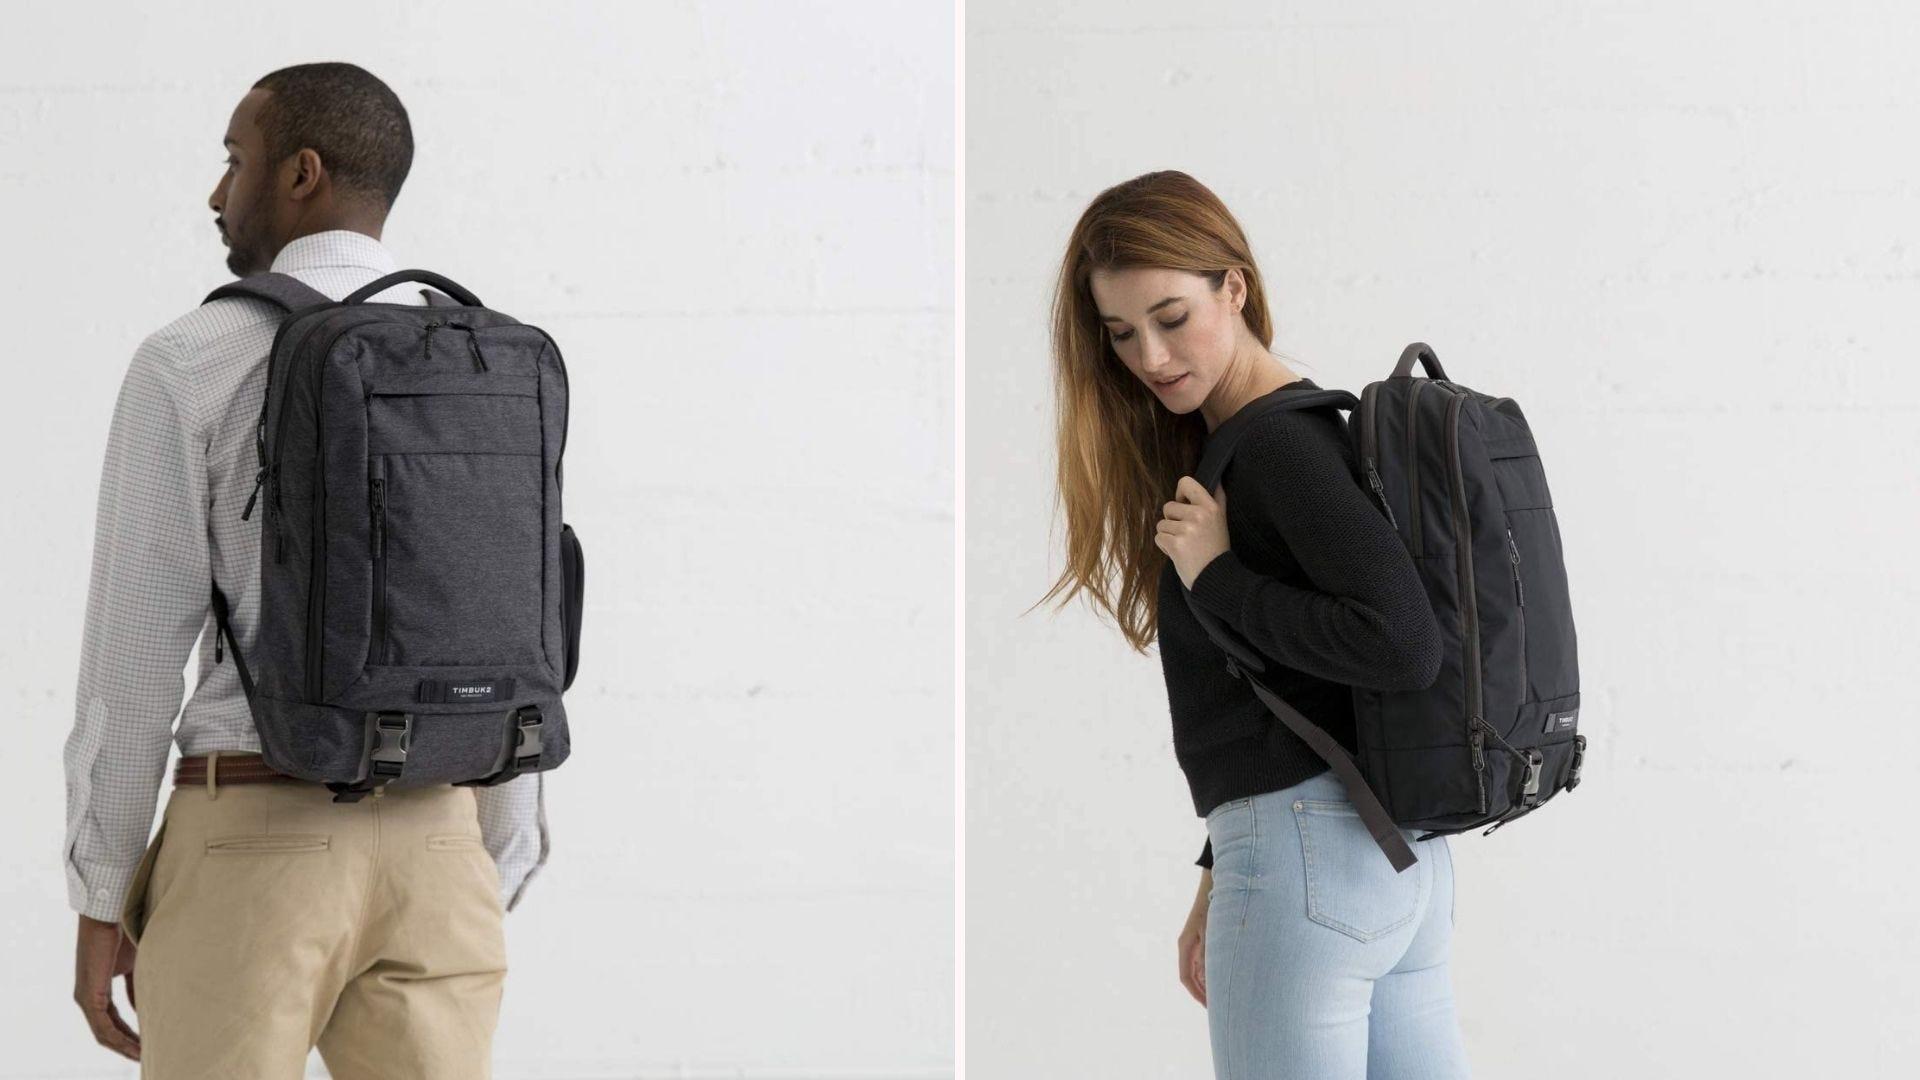 Two people wearing a dark gray/black backpack